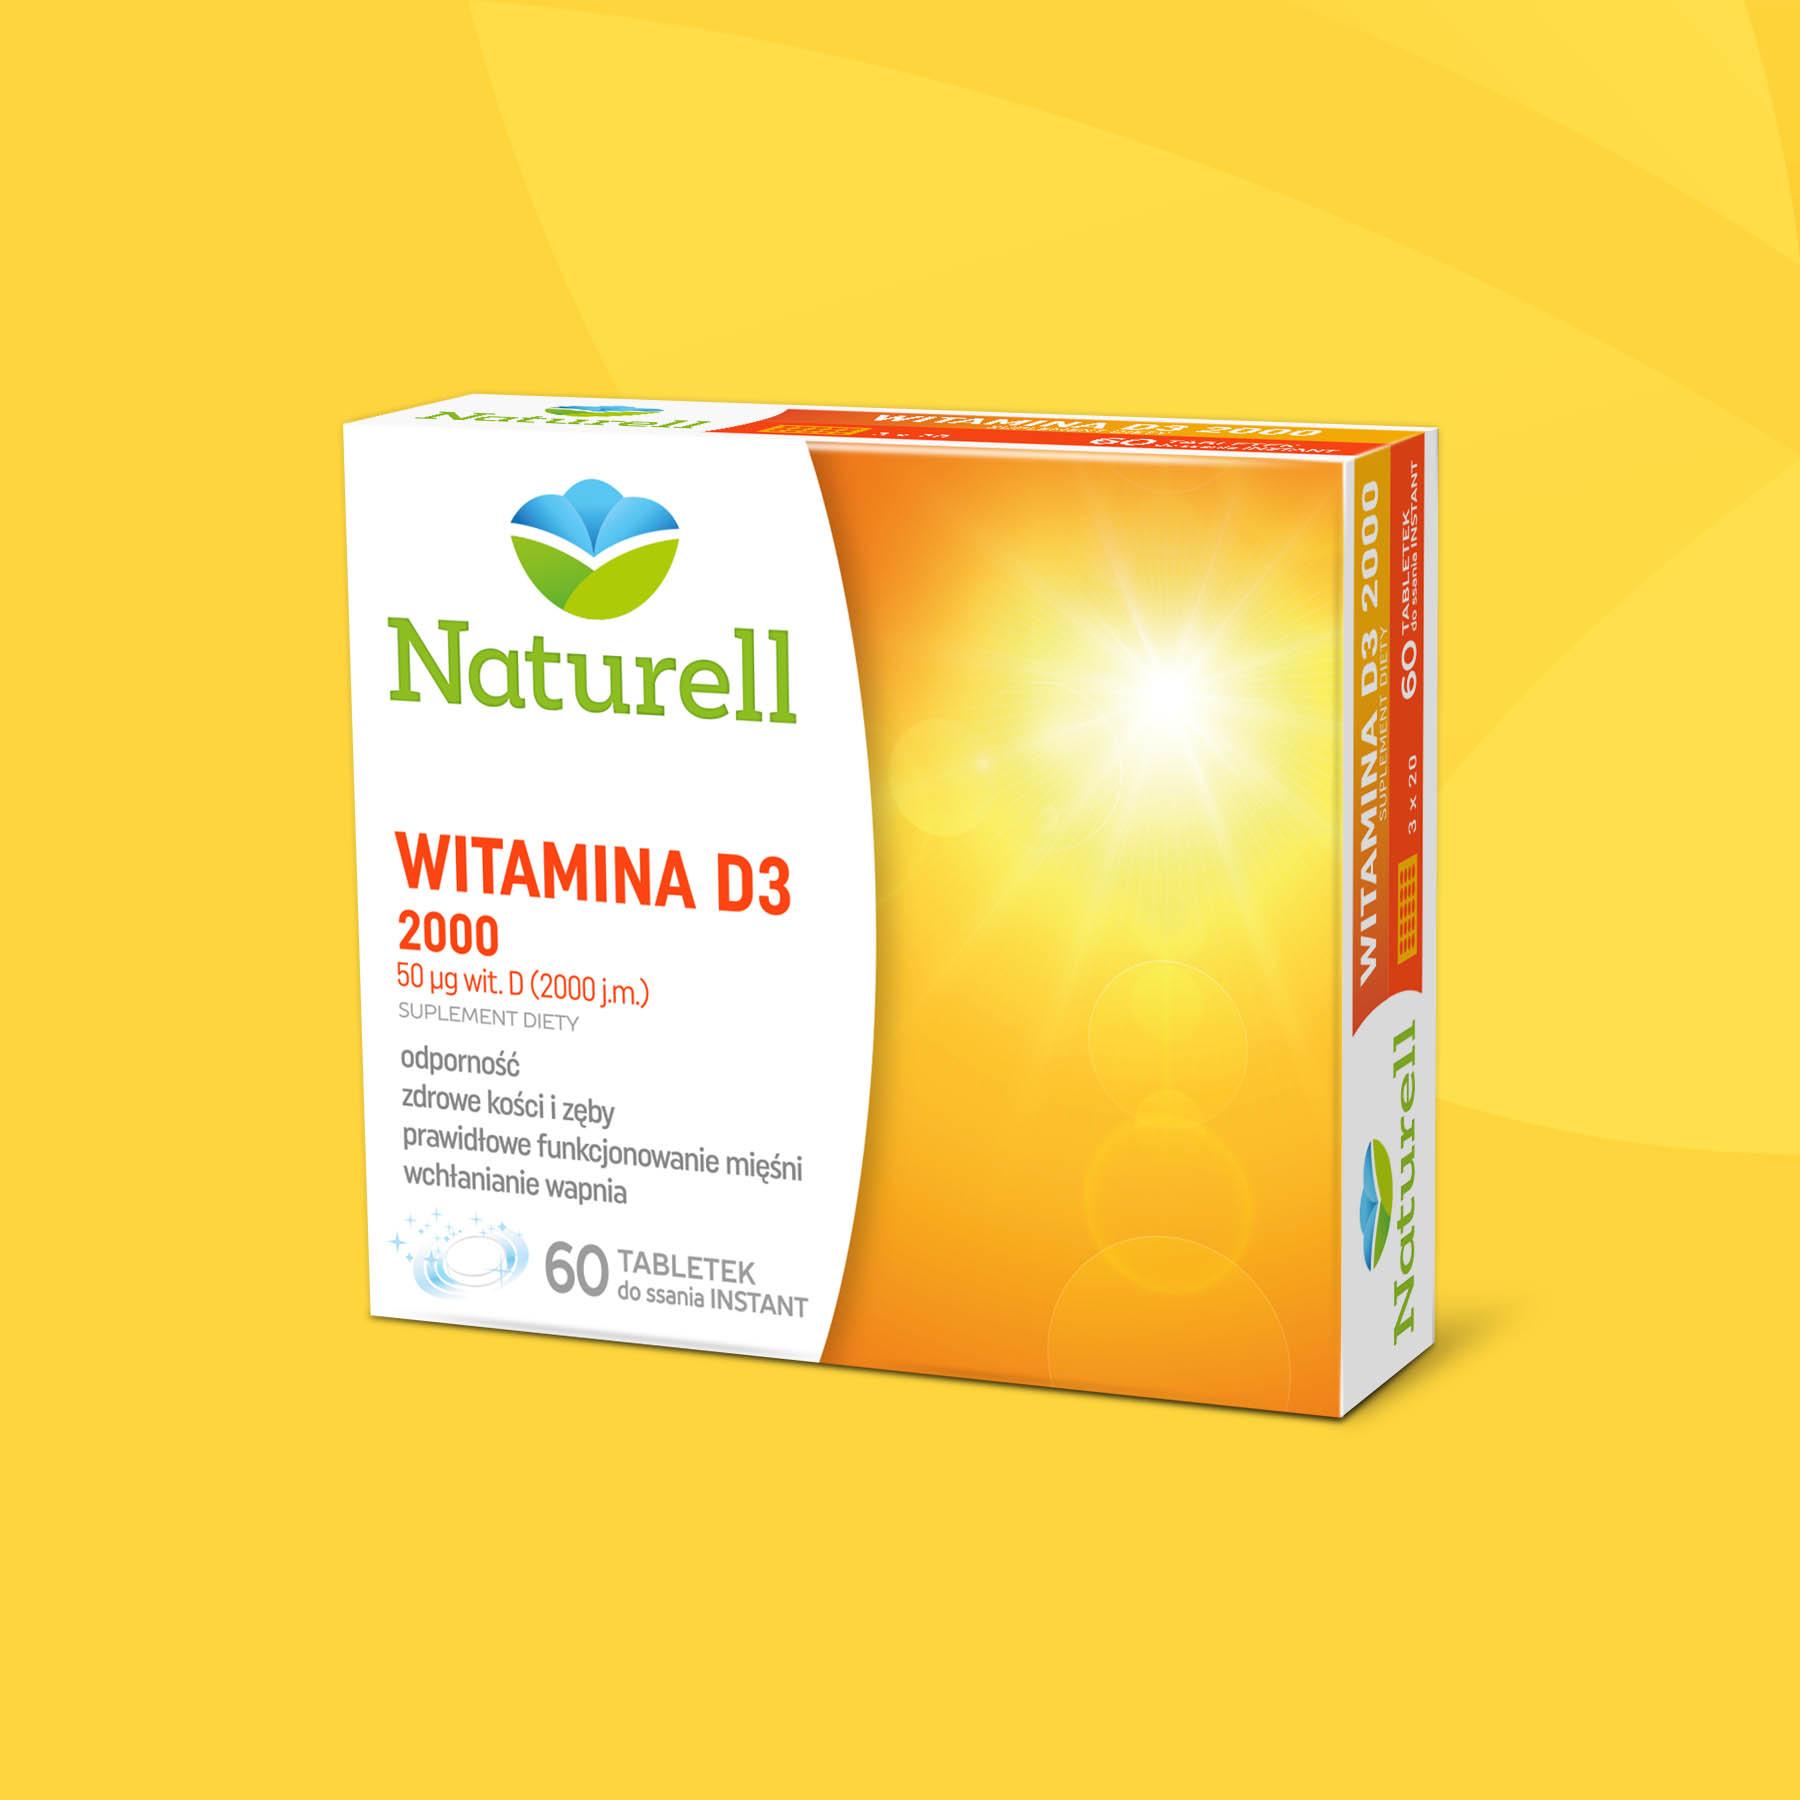 Naturell Vitamin D3 Package Design